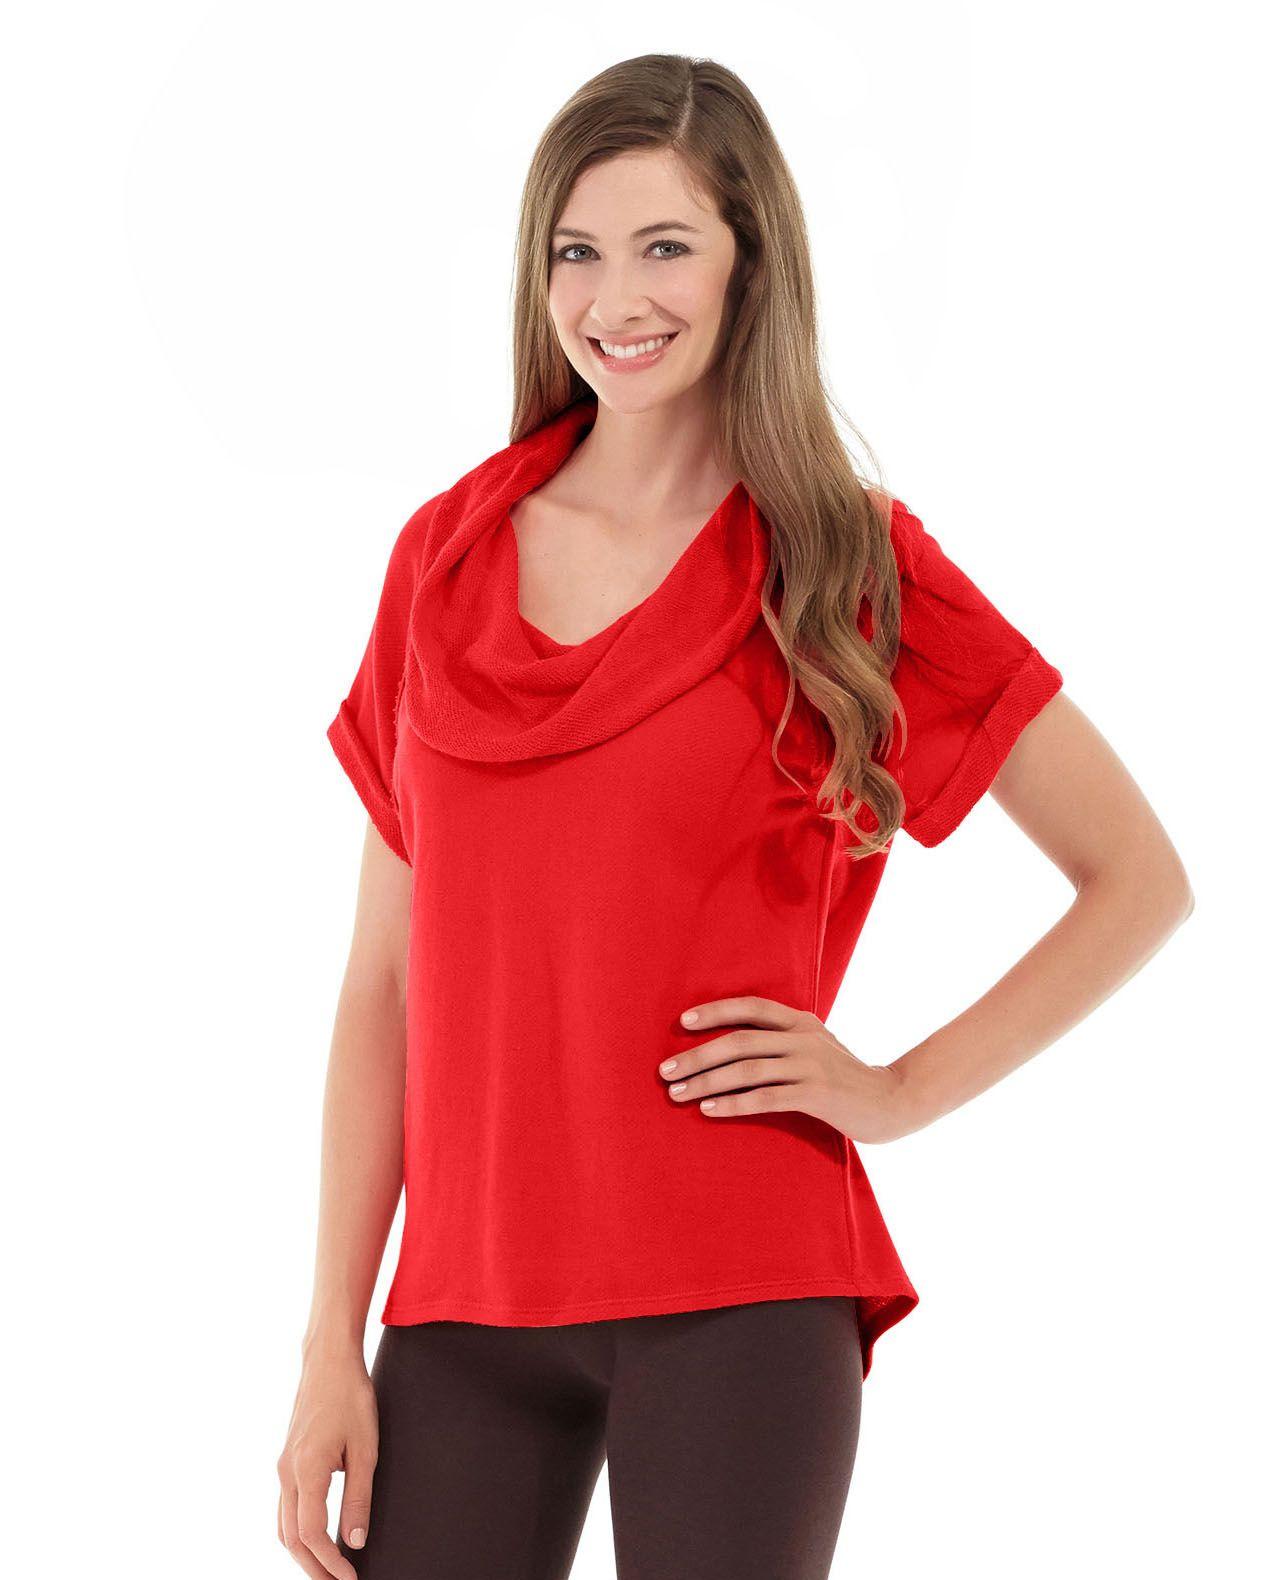 Lavalliere Collar Shirt